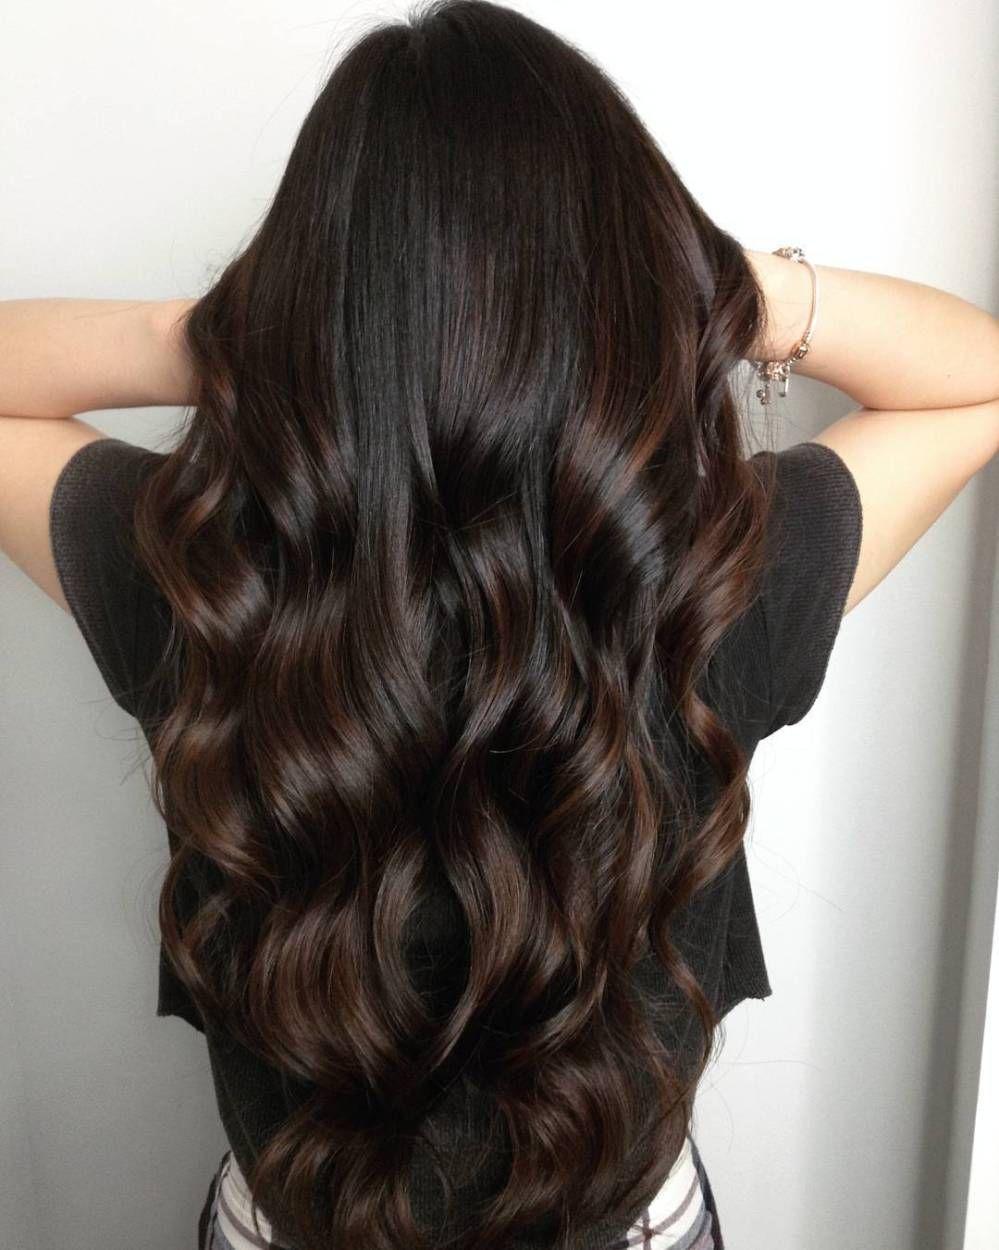 Dark Chocolate Hair A Mix Of Honey Mocha And Violet Brown Hair Dye Mocha Brown Hair Mocha Hair